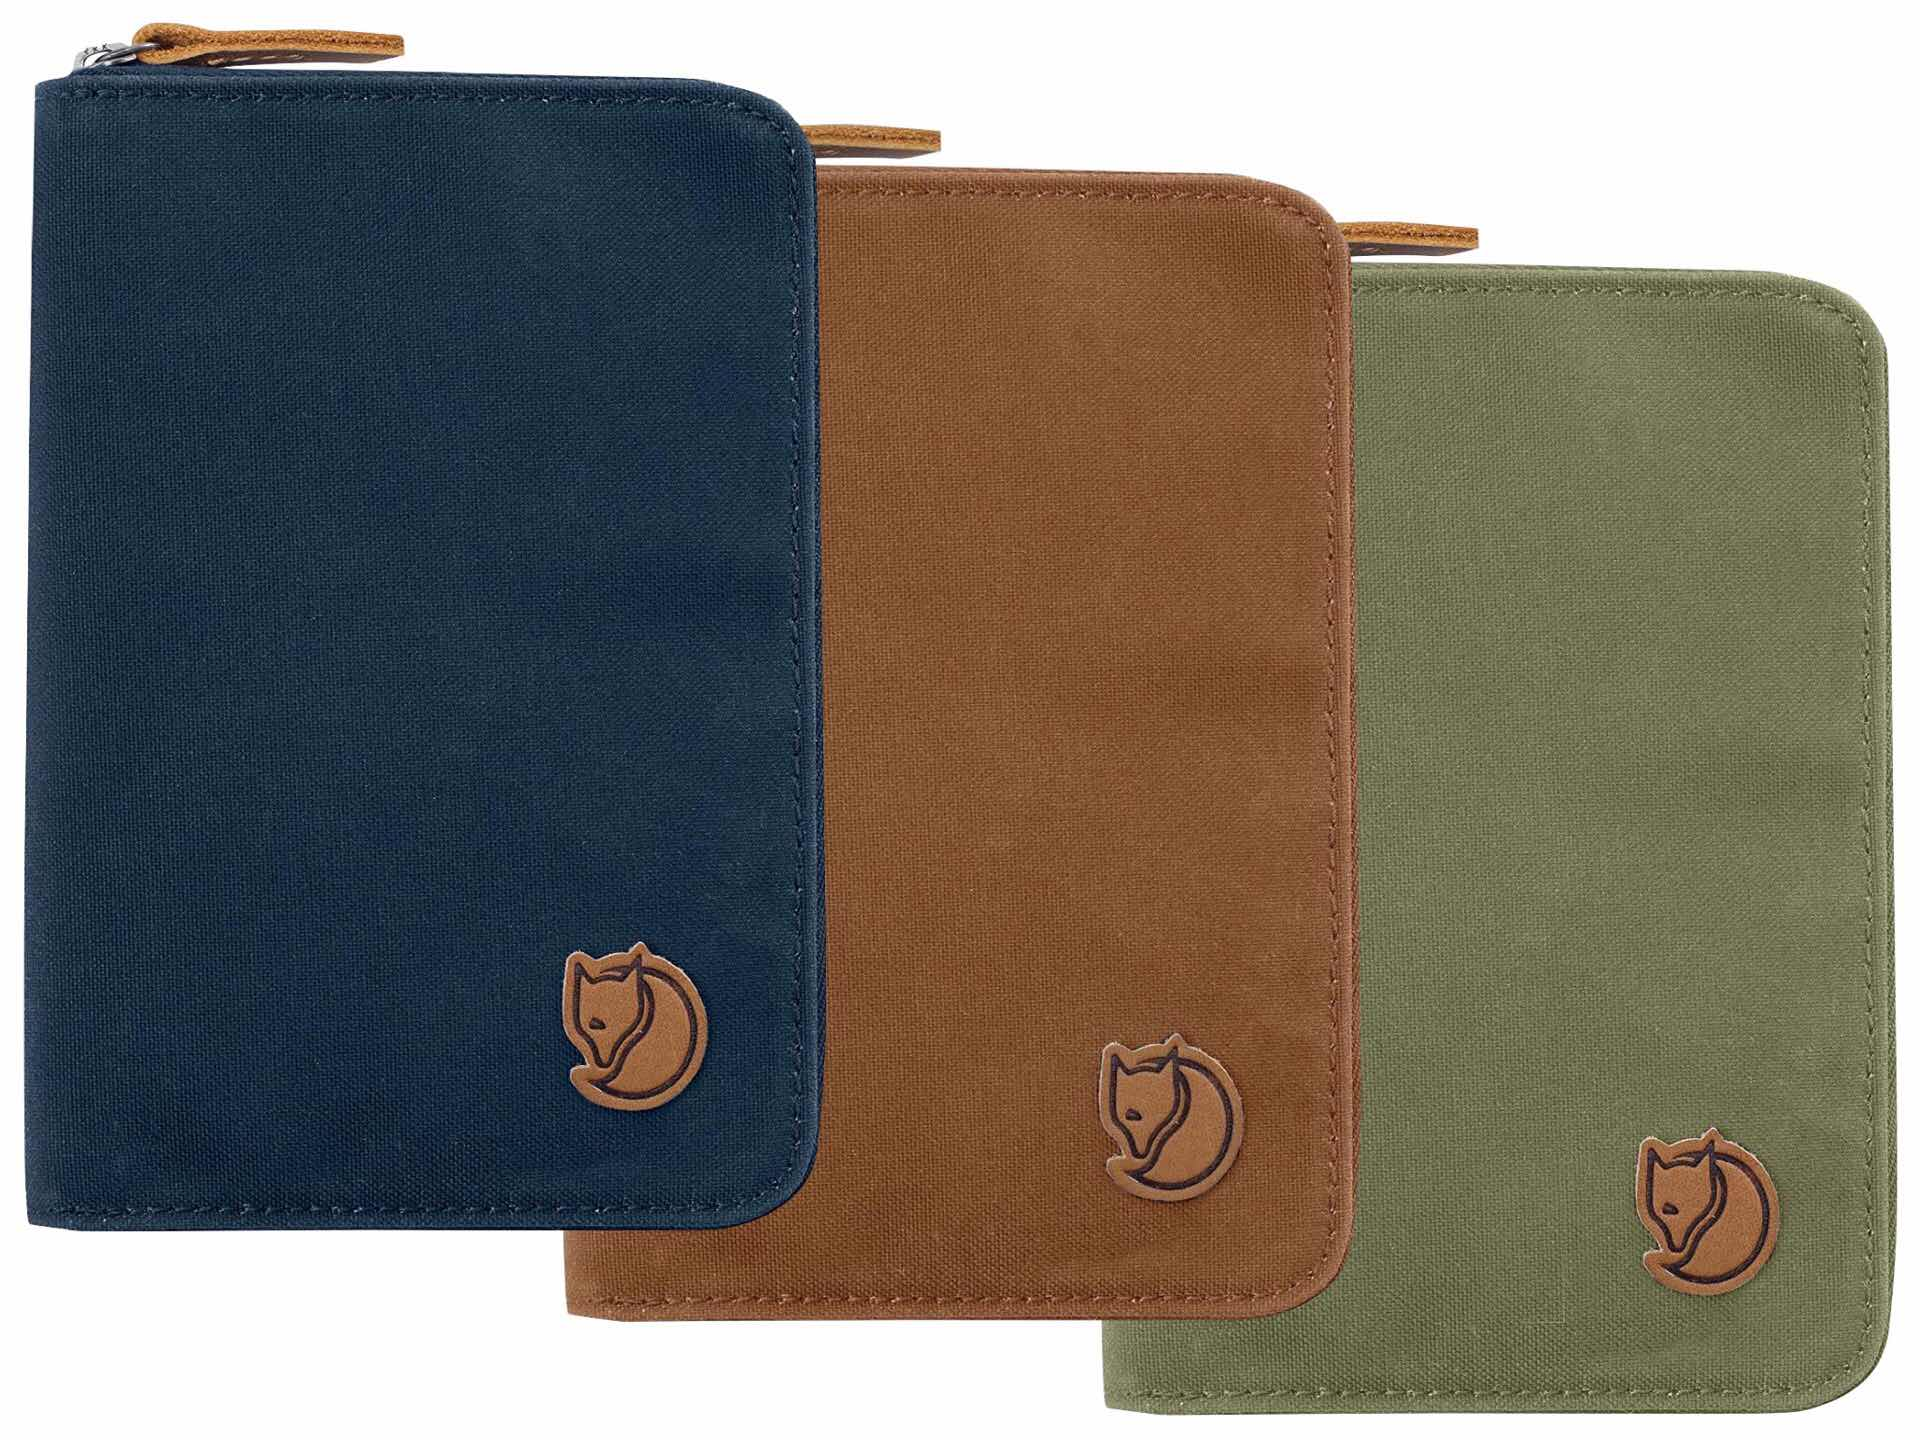 Fjällräven passport wallet. ($60, available in a variety of colors)